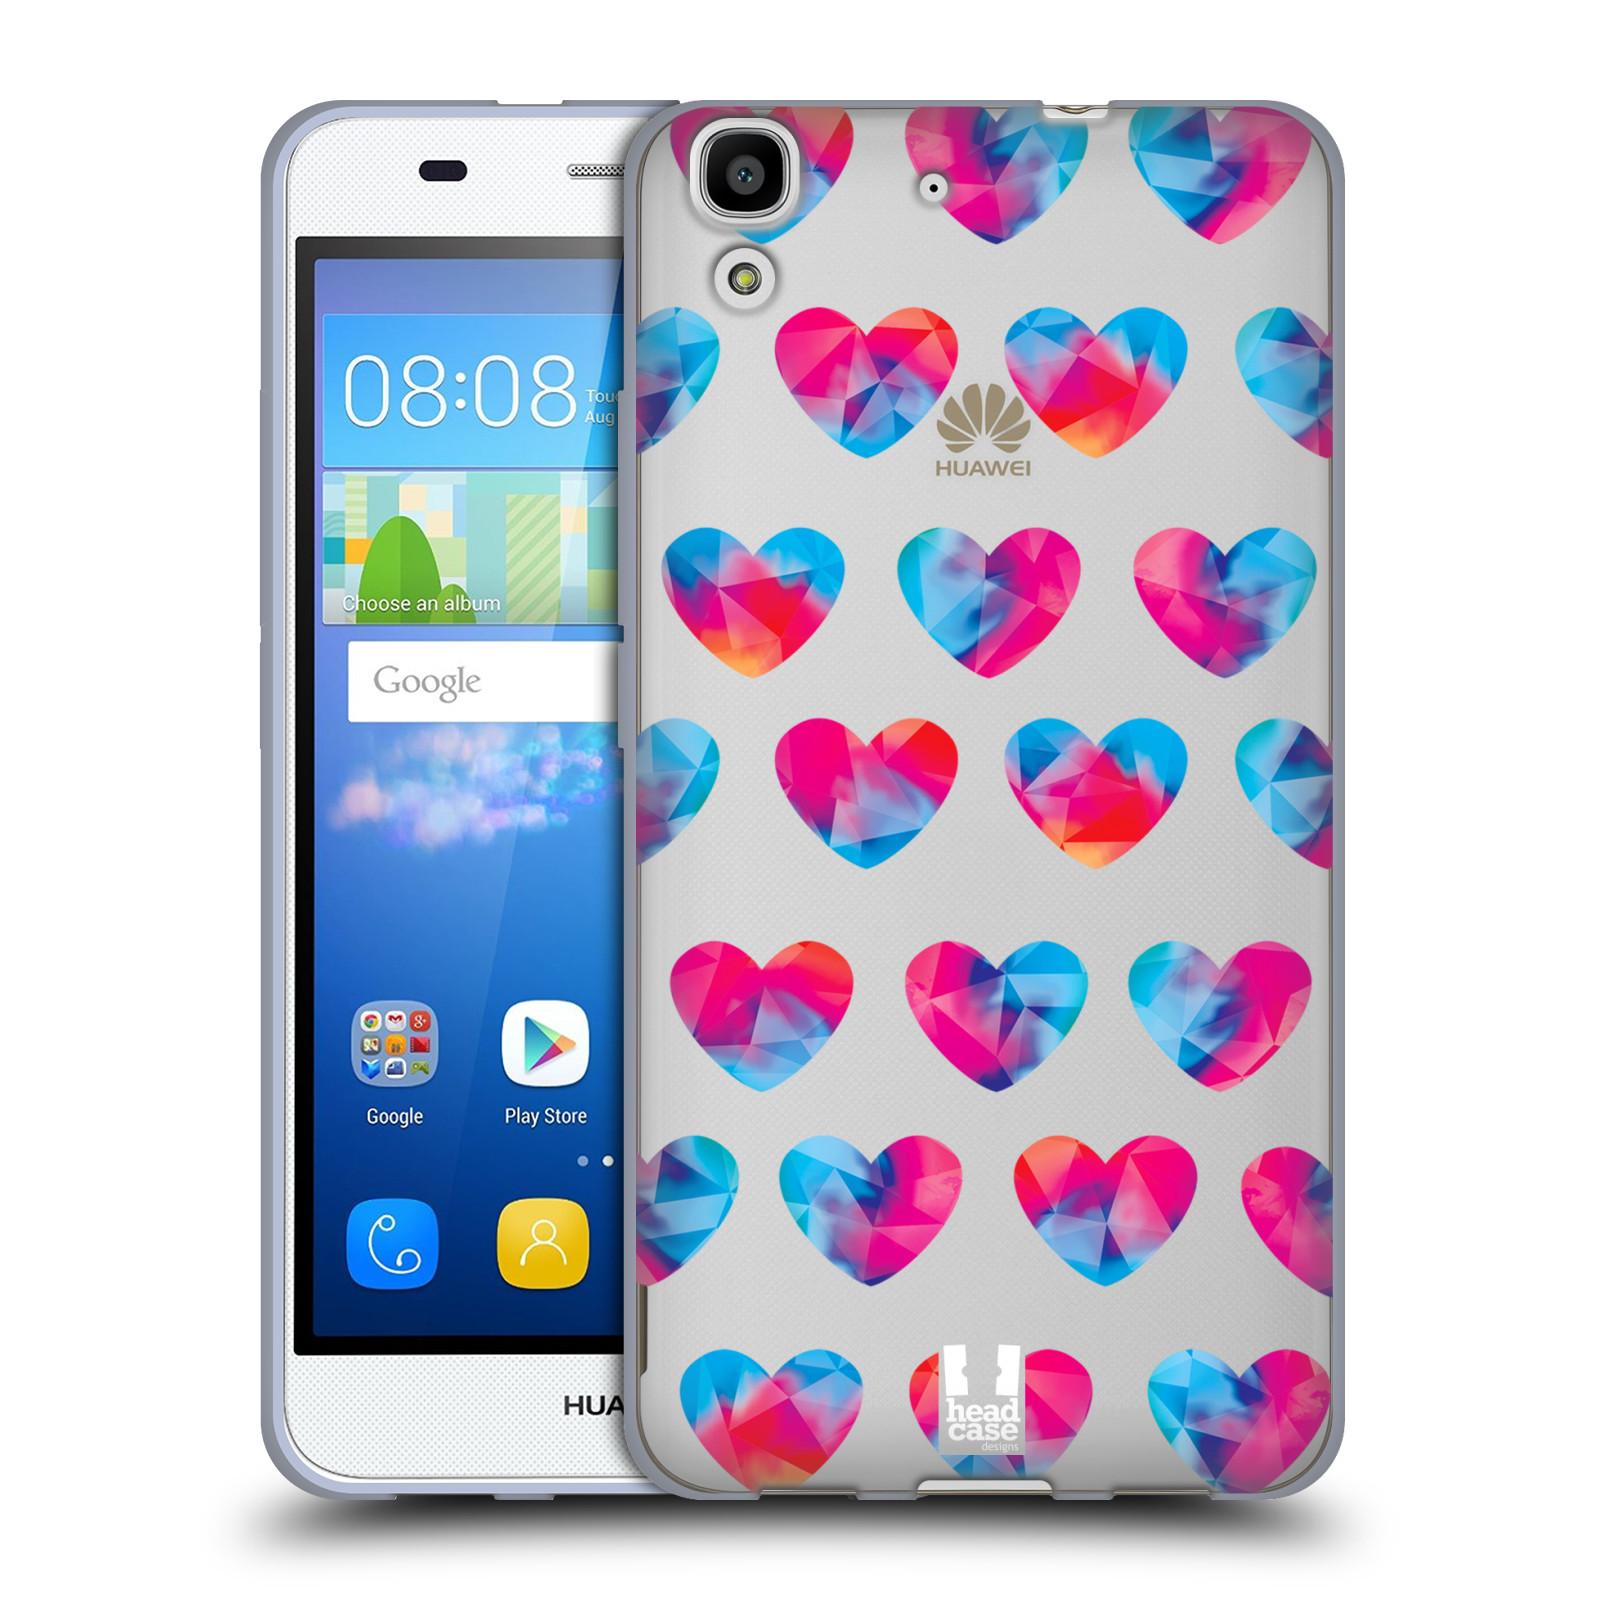 Silikonové pouzdro na mobil Huawei Y6 - Head Case - Srdíčka hrající barvami